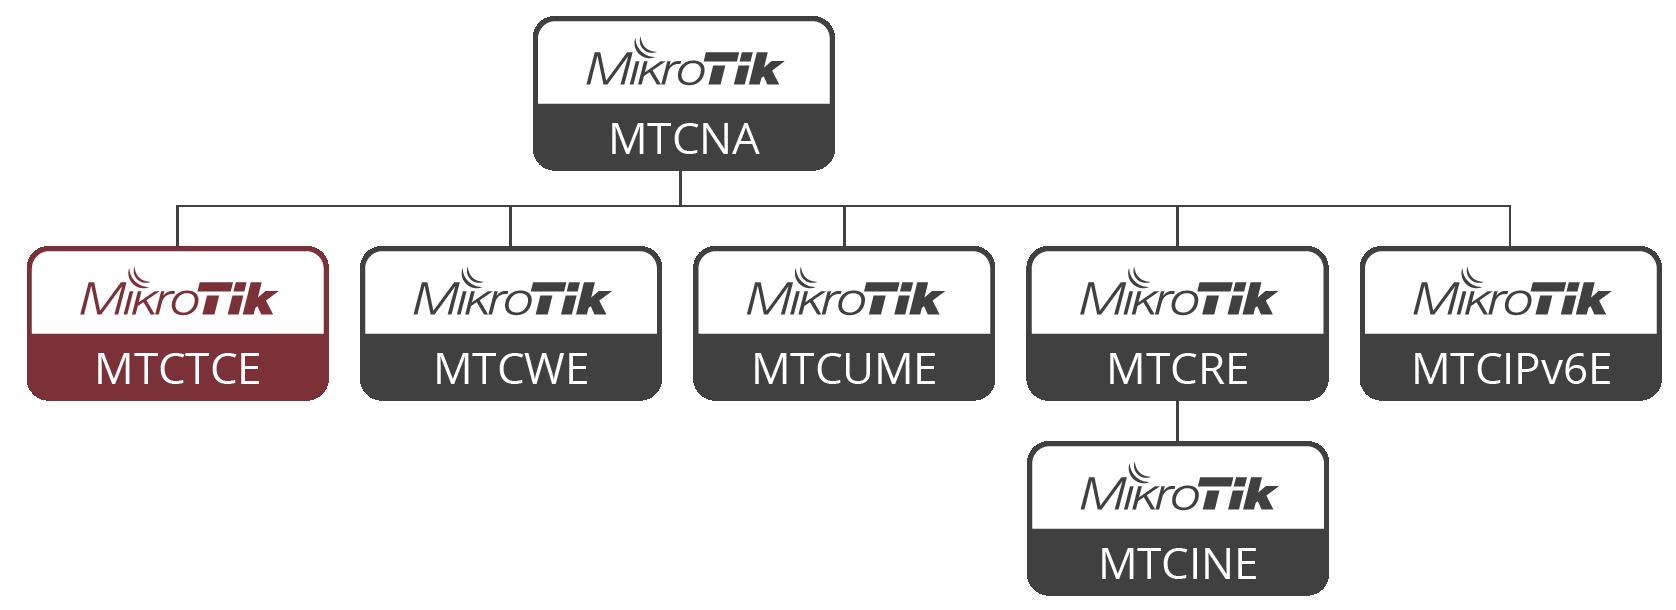 EGITIM-MTCTCE MTCTCE Mikrotik Gelişmiş Trafik Kontrol Eğitimi